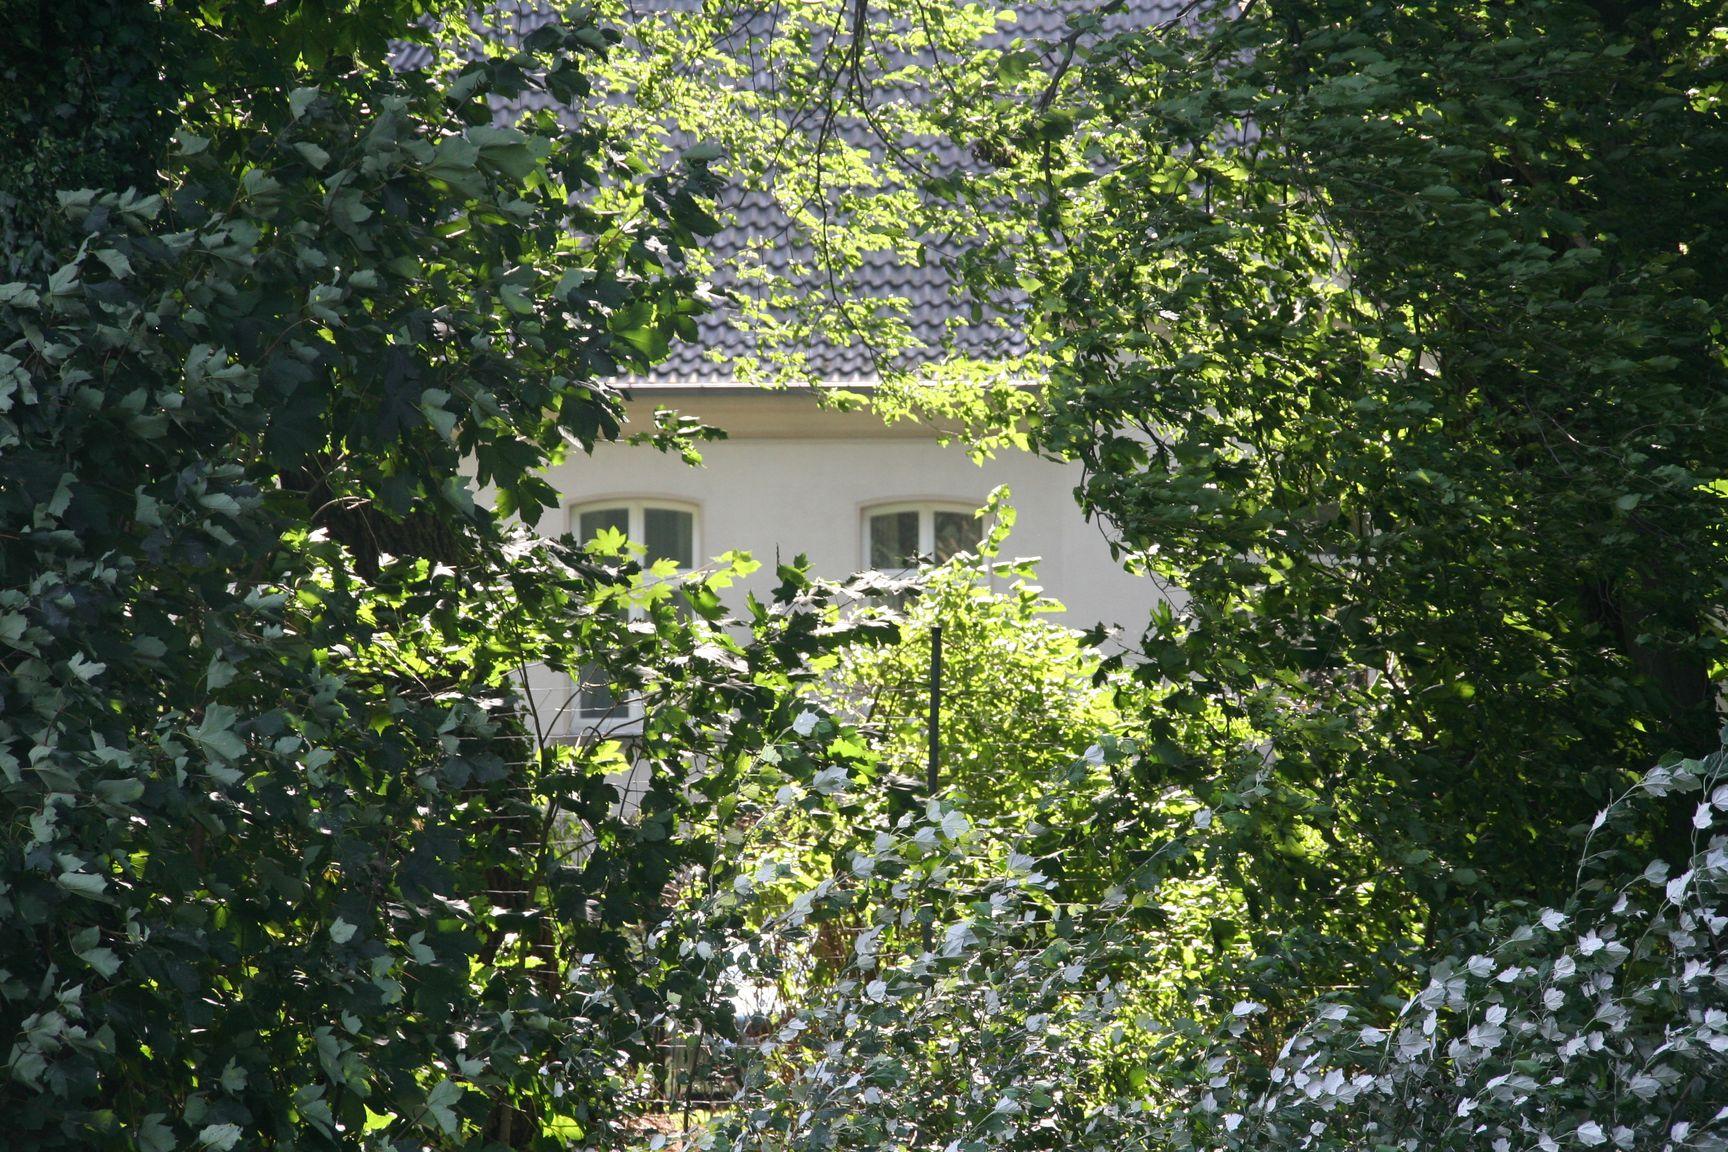 10_Gut_Wietersheim_IMG_7488